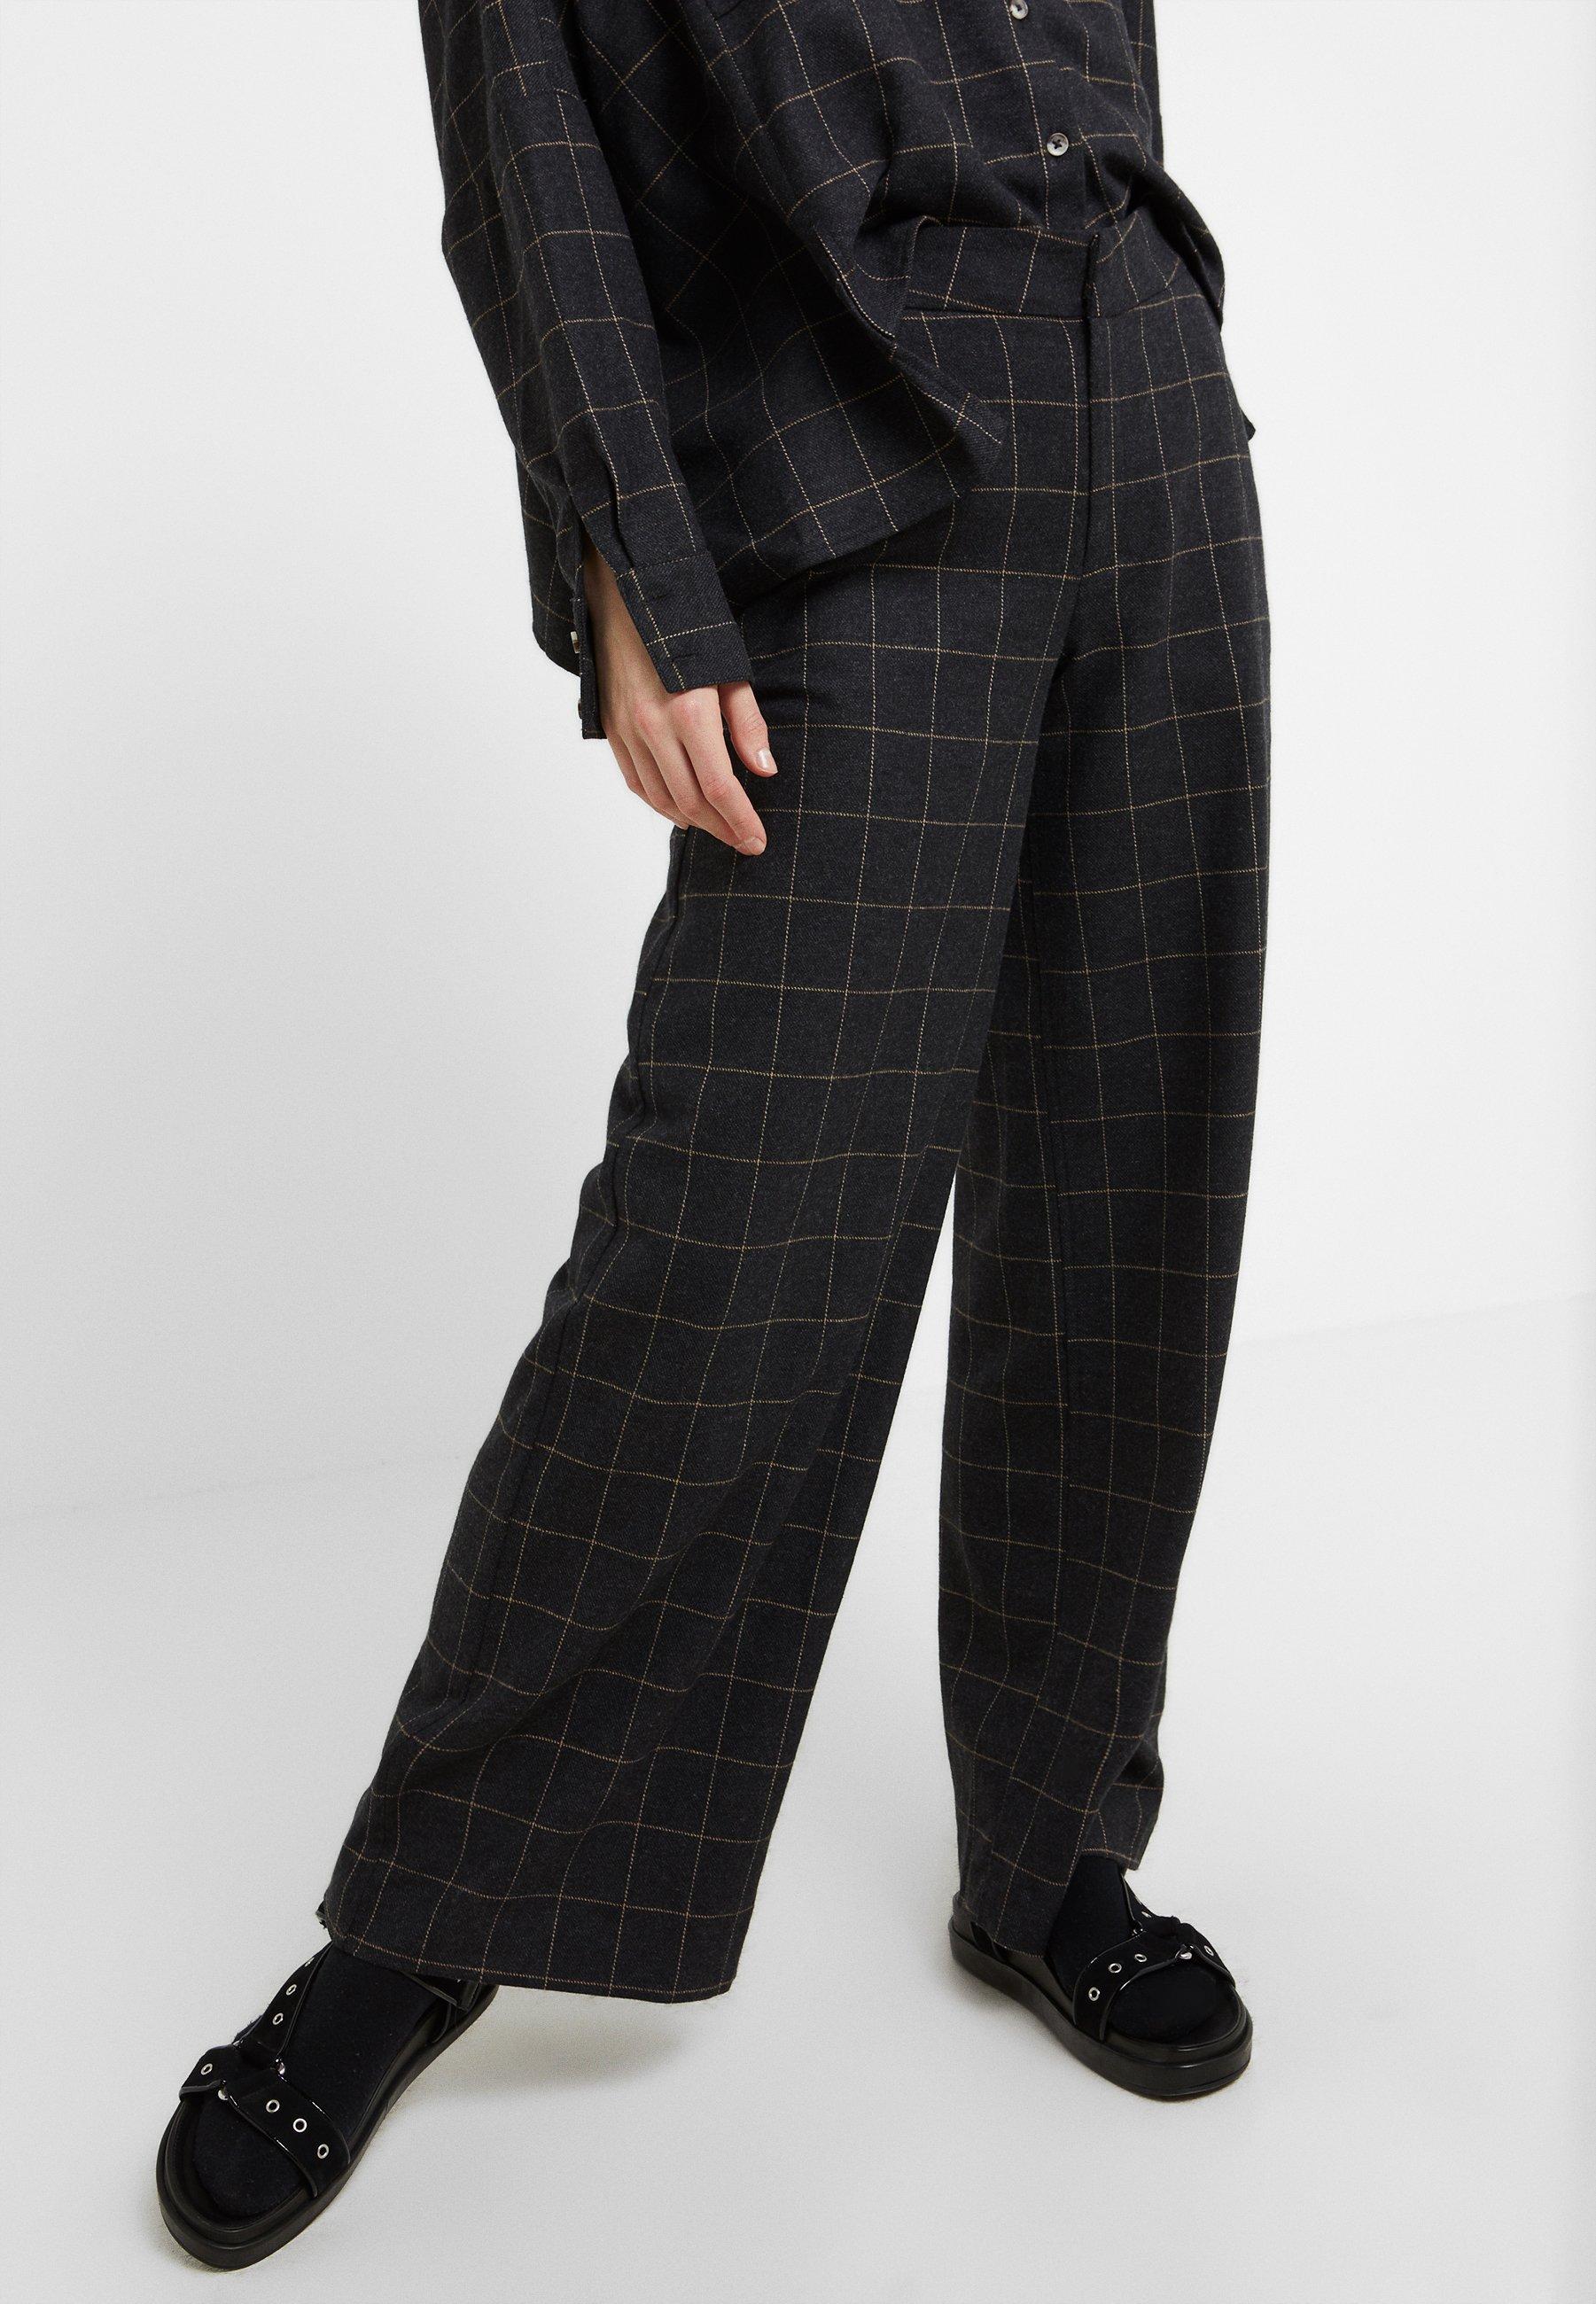 Holzweiler RYLLIK MIX - Pantalones - dark grey entrega gratis La mejor decision